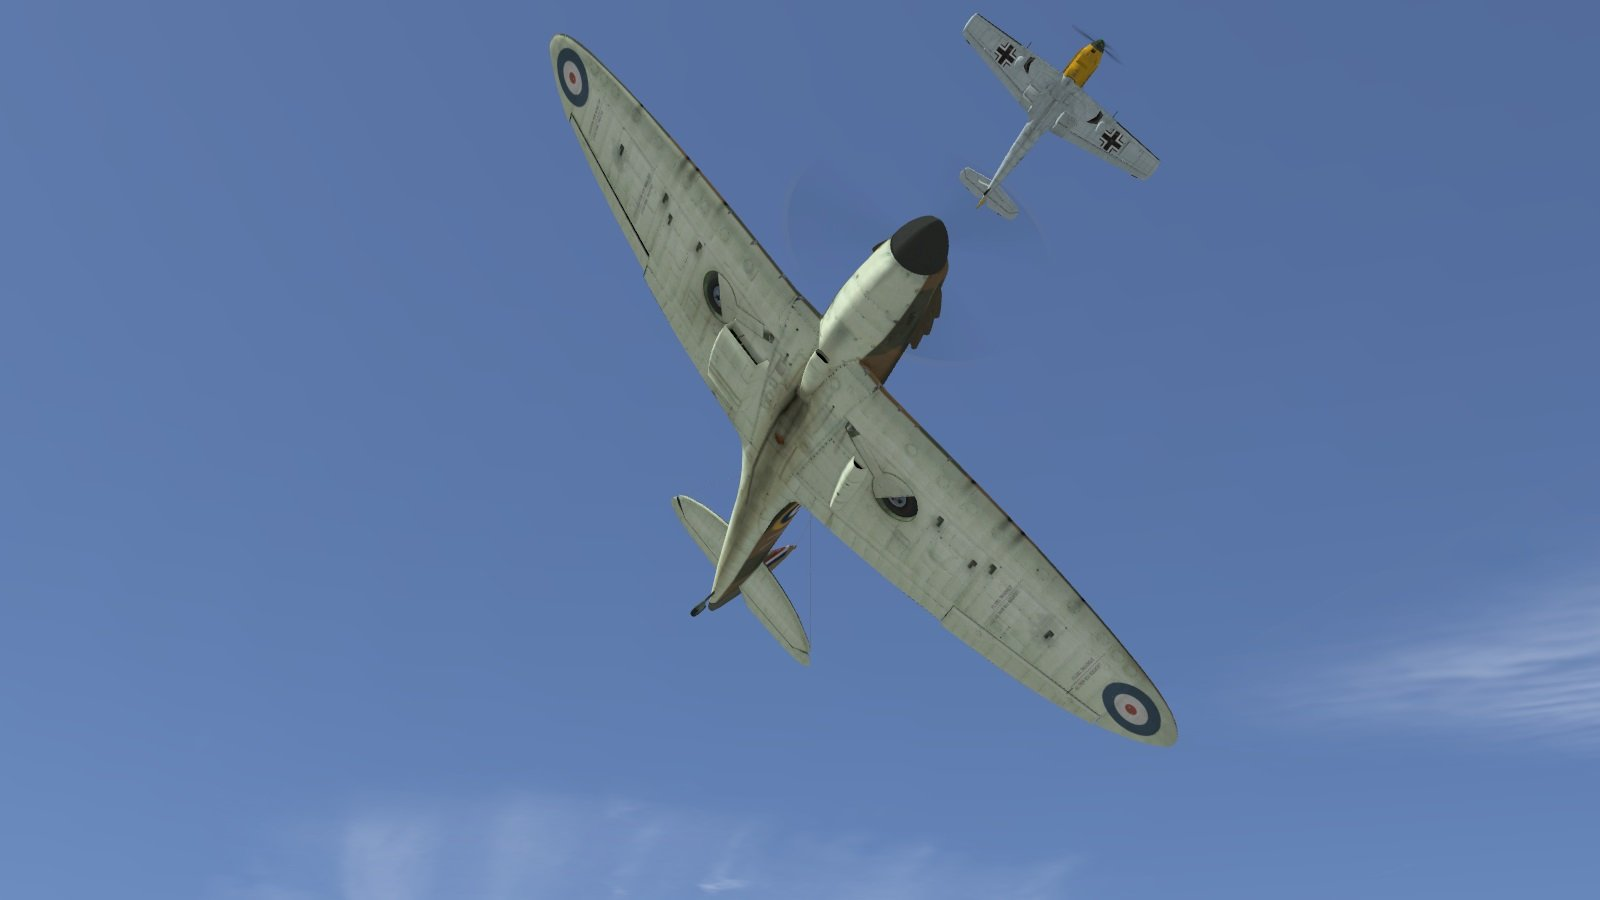 609 Squadron intercepts Hostile 101, 23 July 1940 - Battle of Britain 2